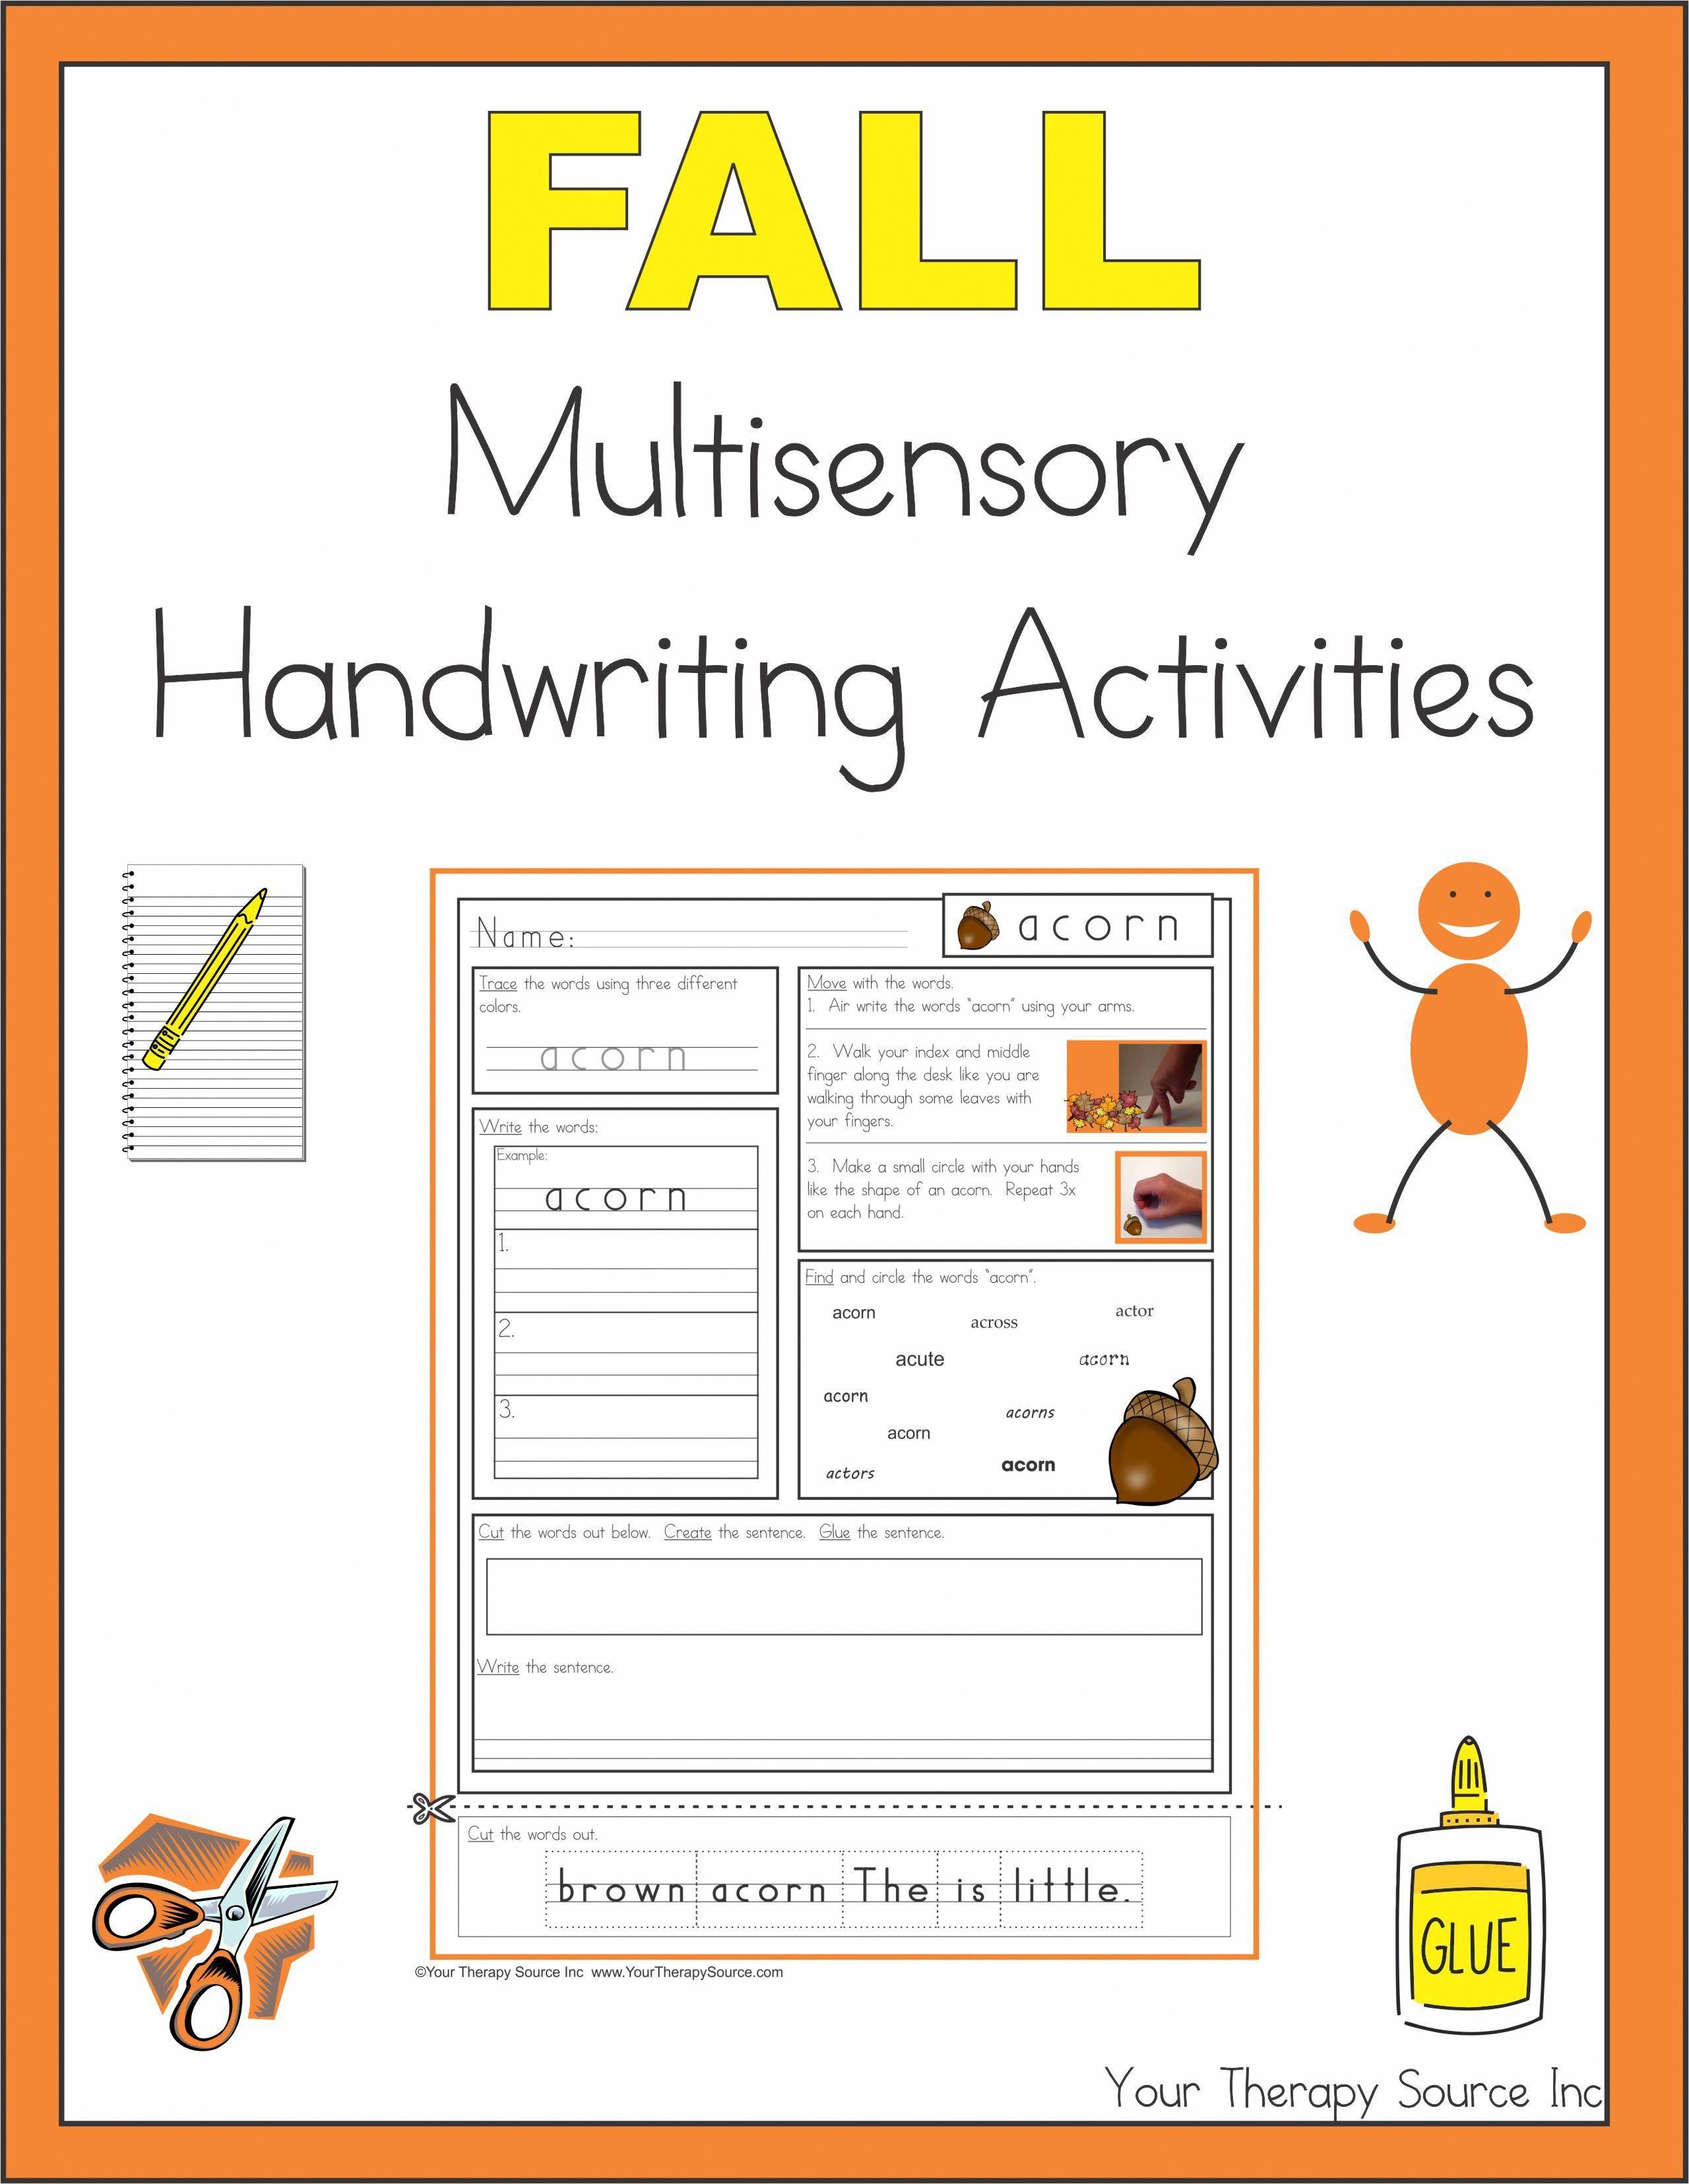 Fall Multisensory Handwriting Activities Fall